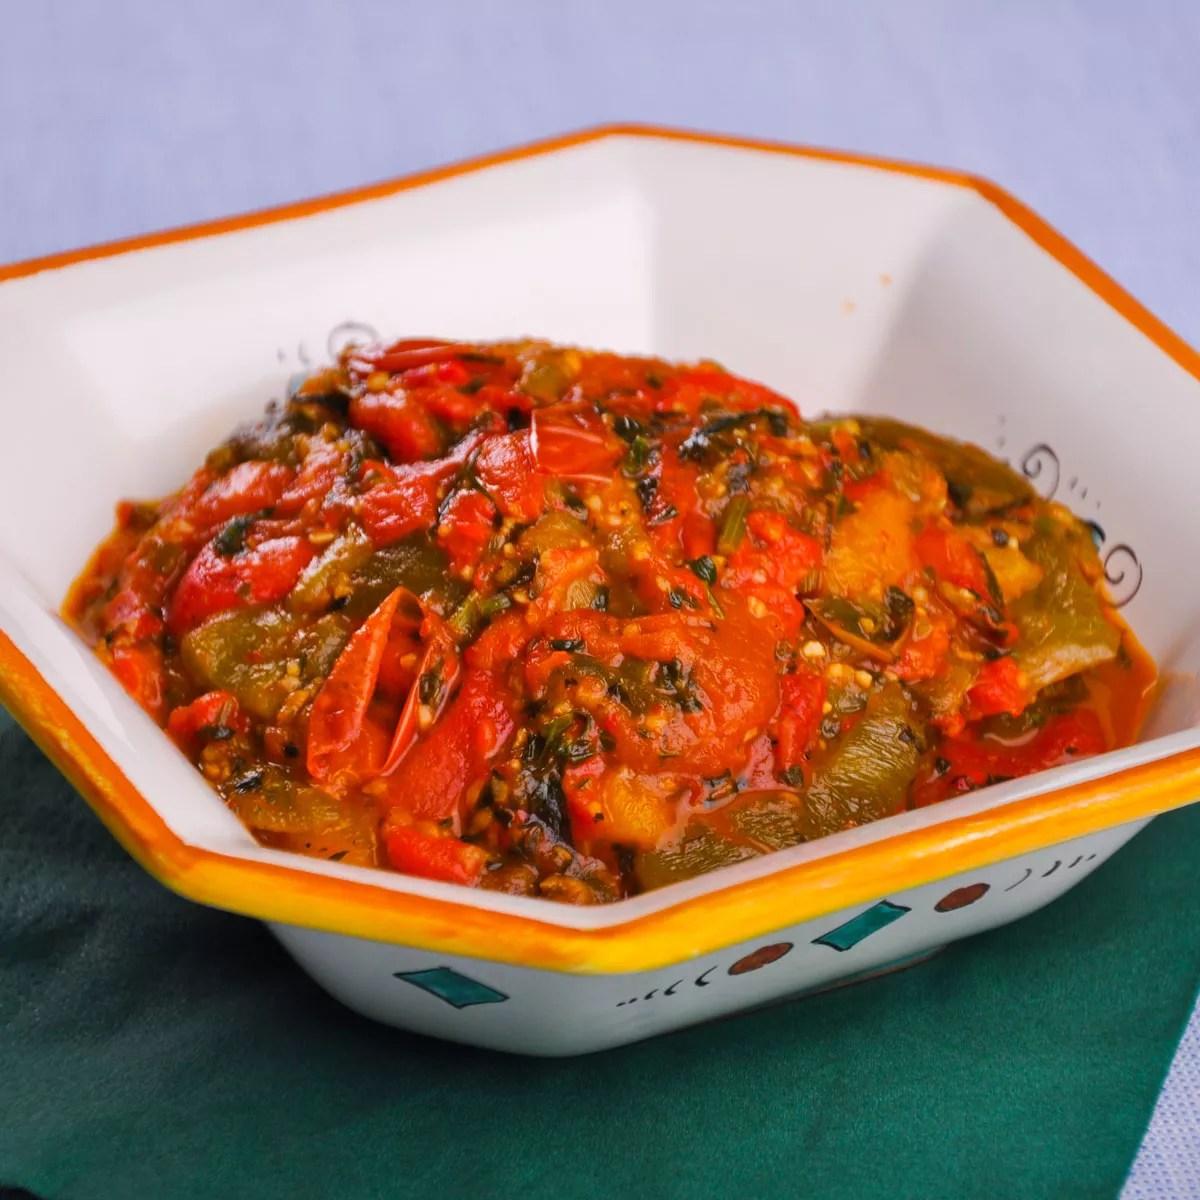 Recette salade marocaine aux poivrons  Cuisine  Madame Figaro